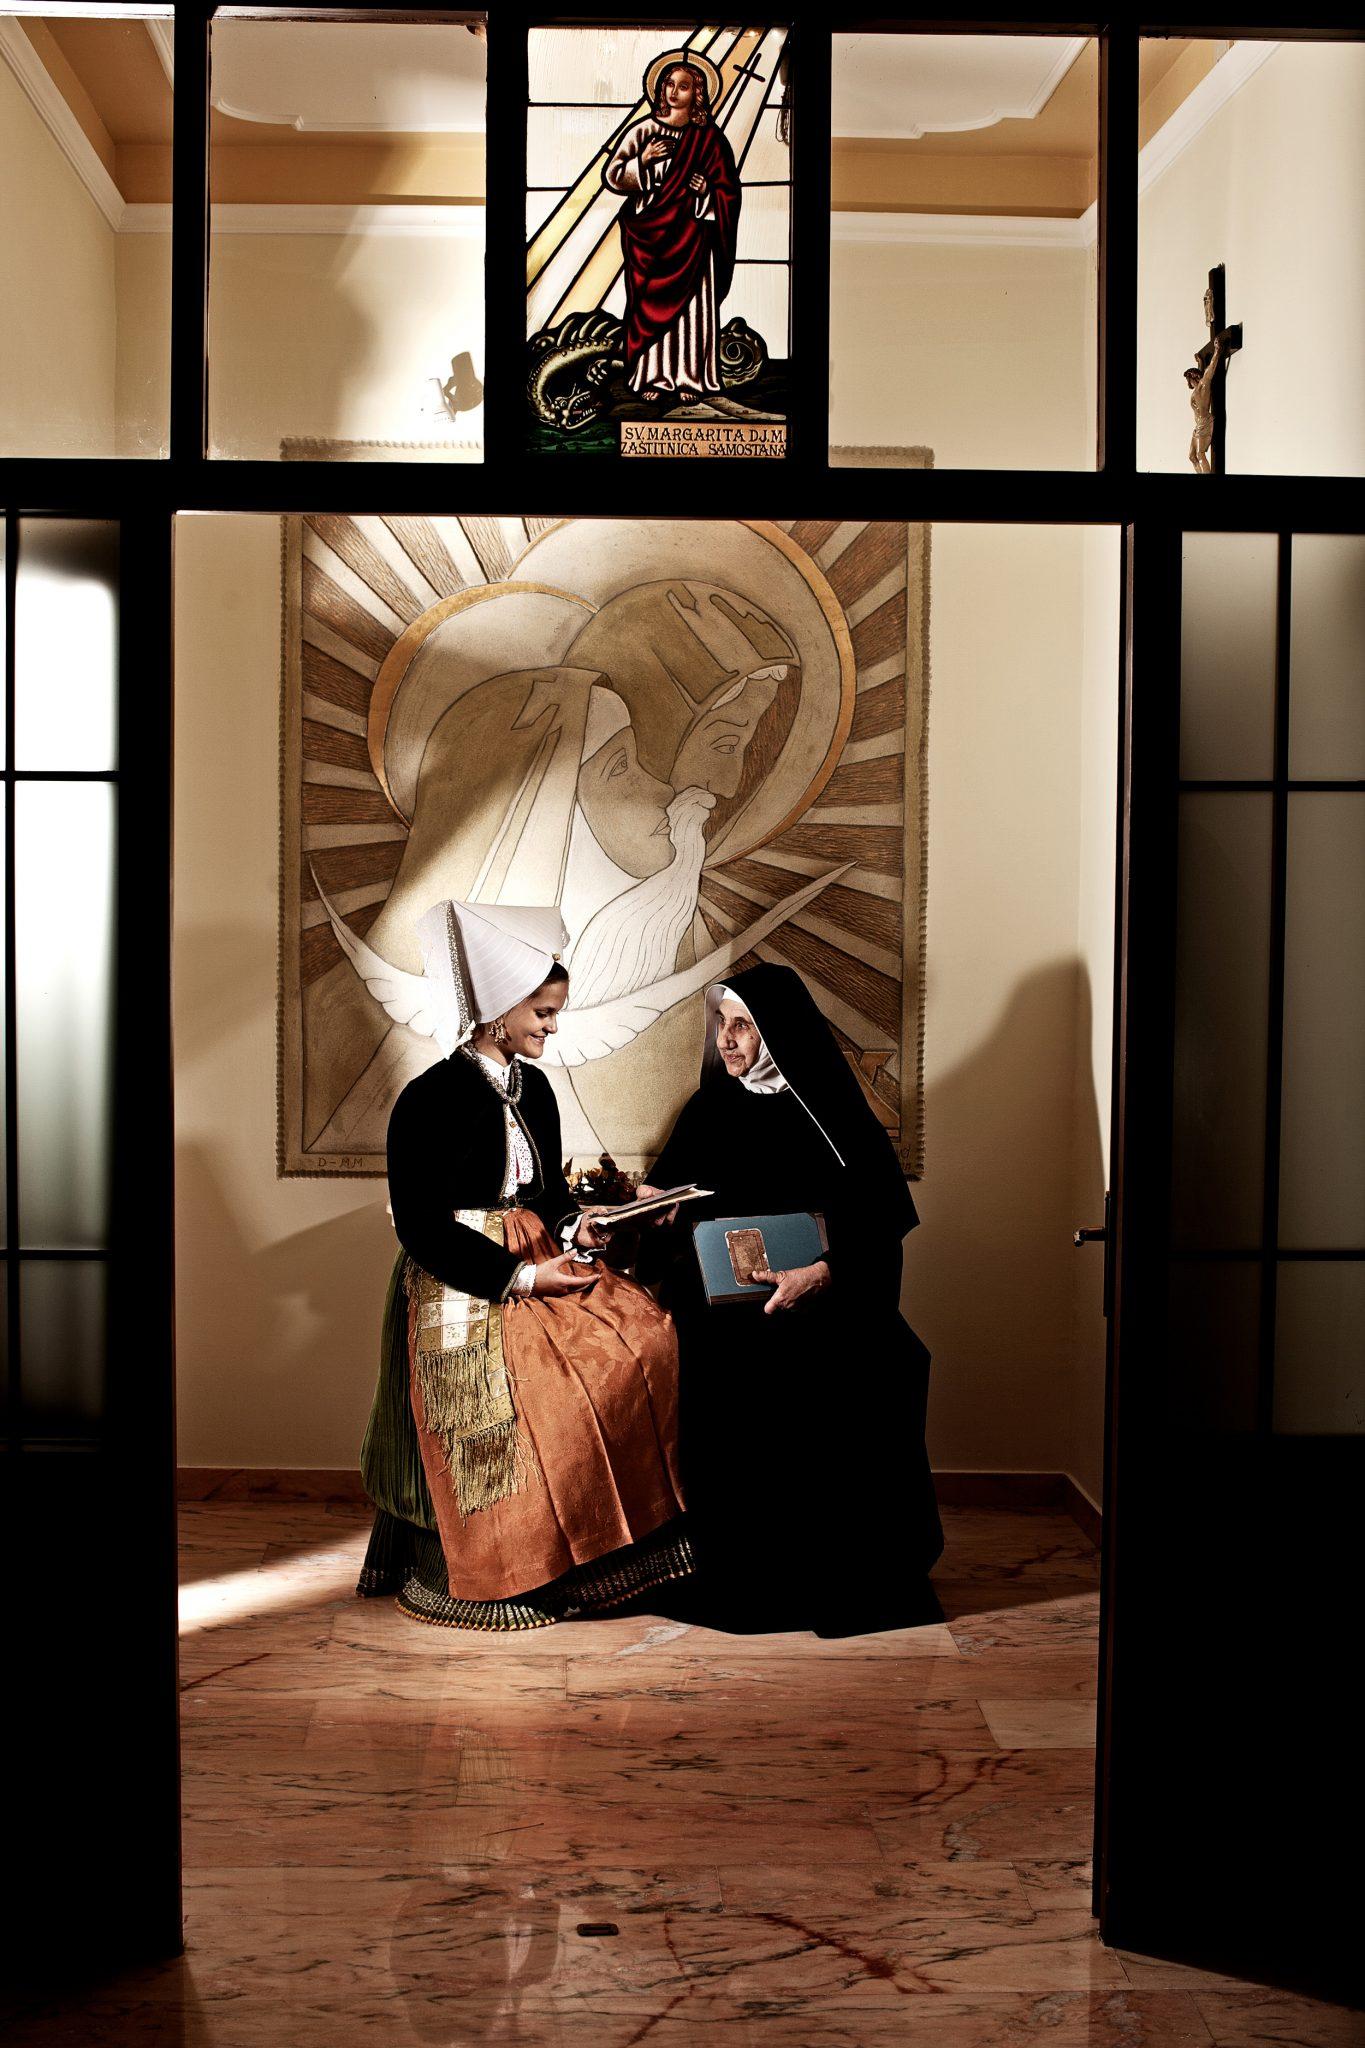 Benediktinski samostan Sv. Margarite Pag